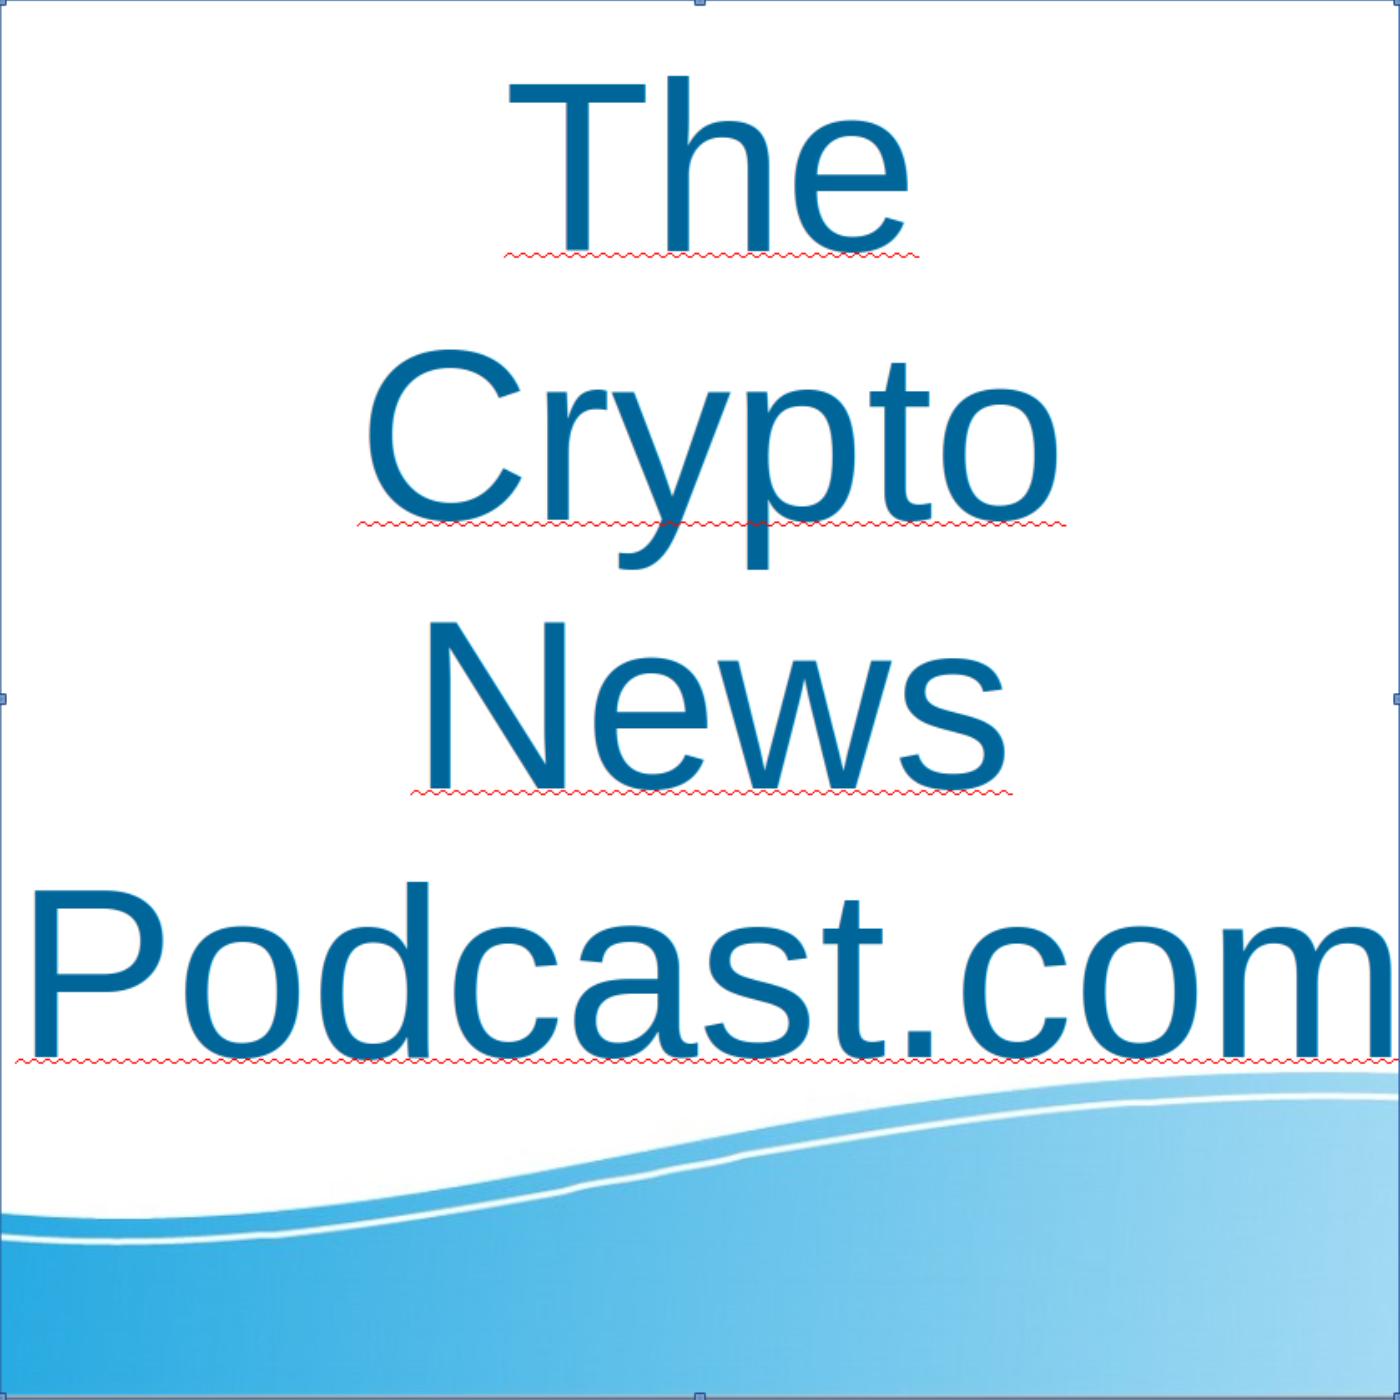 The Crypto News Podcast show art